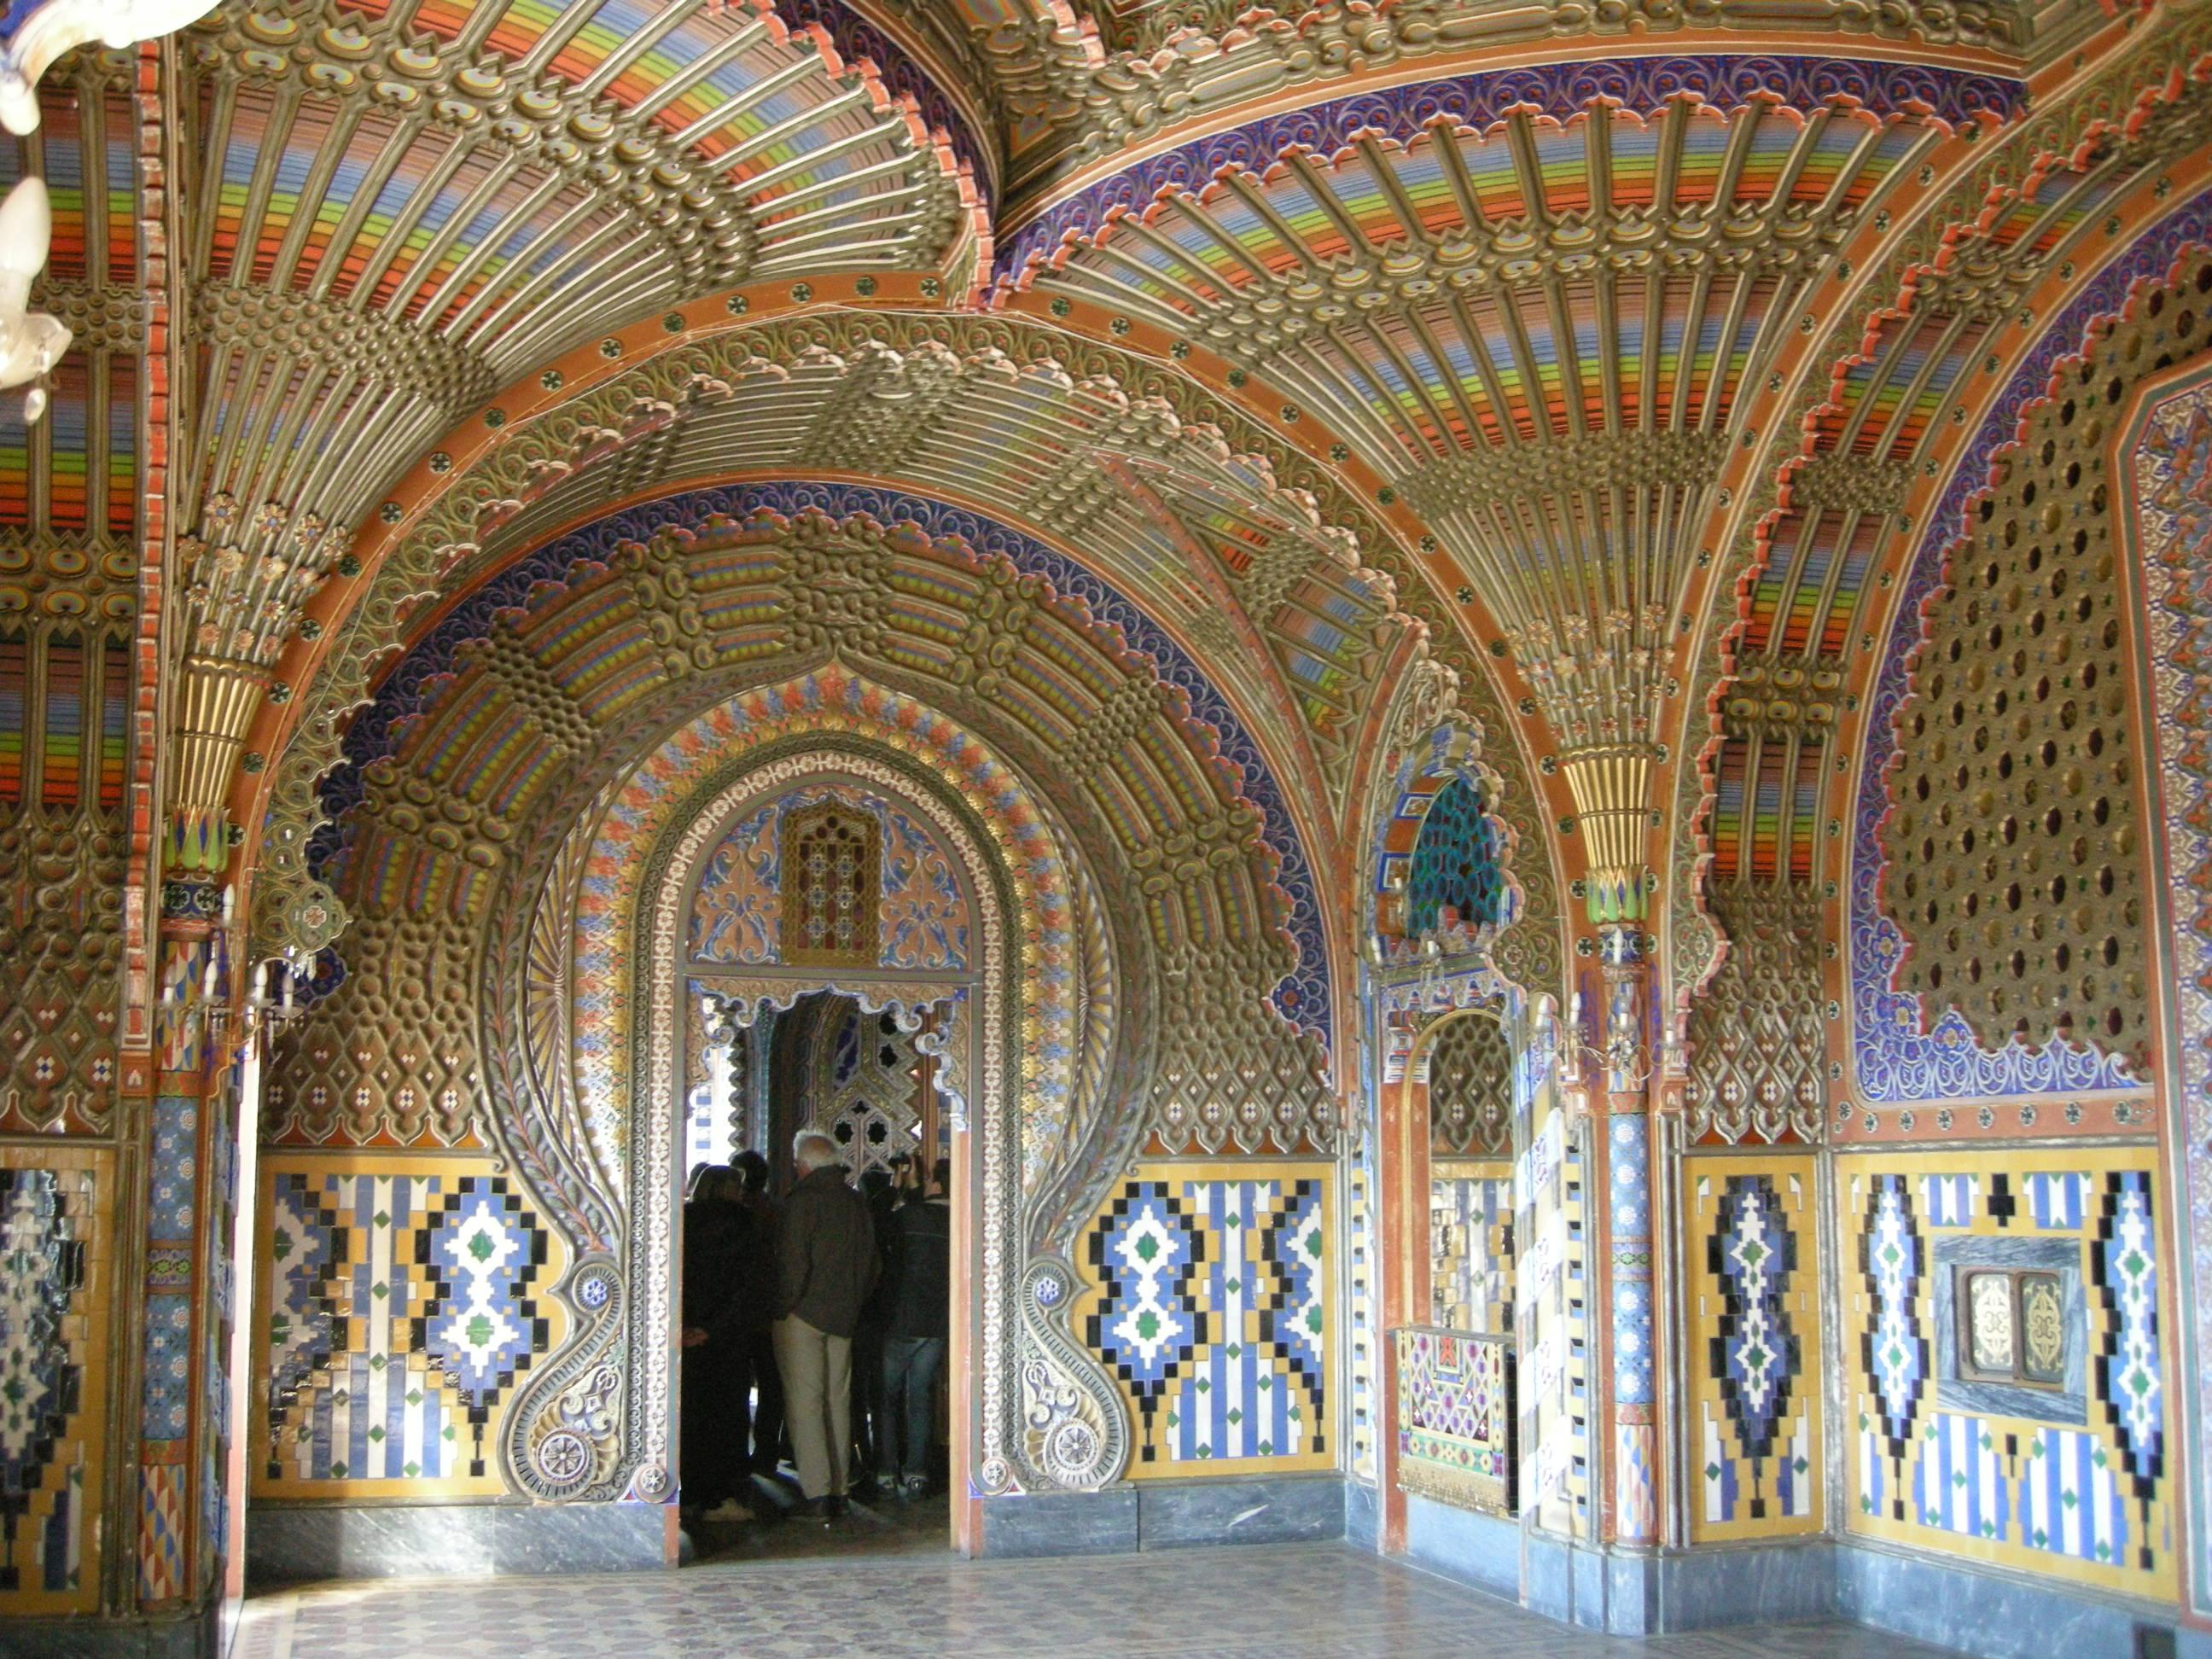 File:Sala dei pavoni 04.JPG - Wikipedia